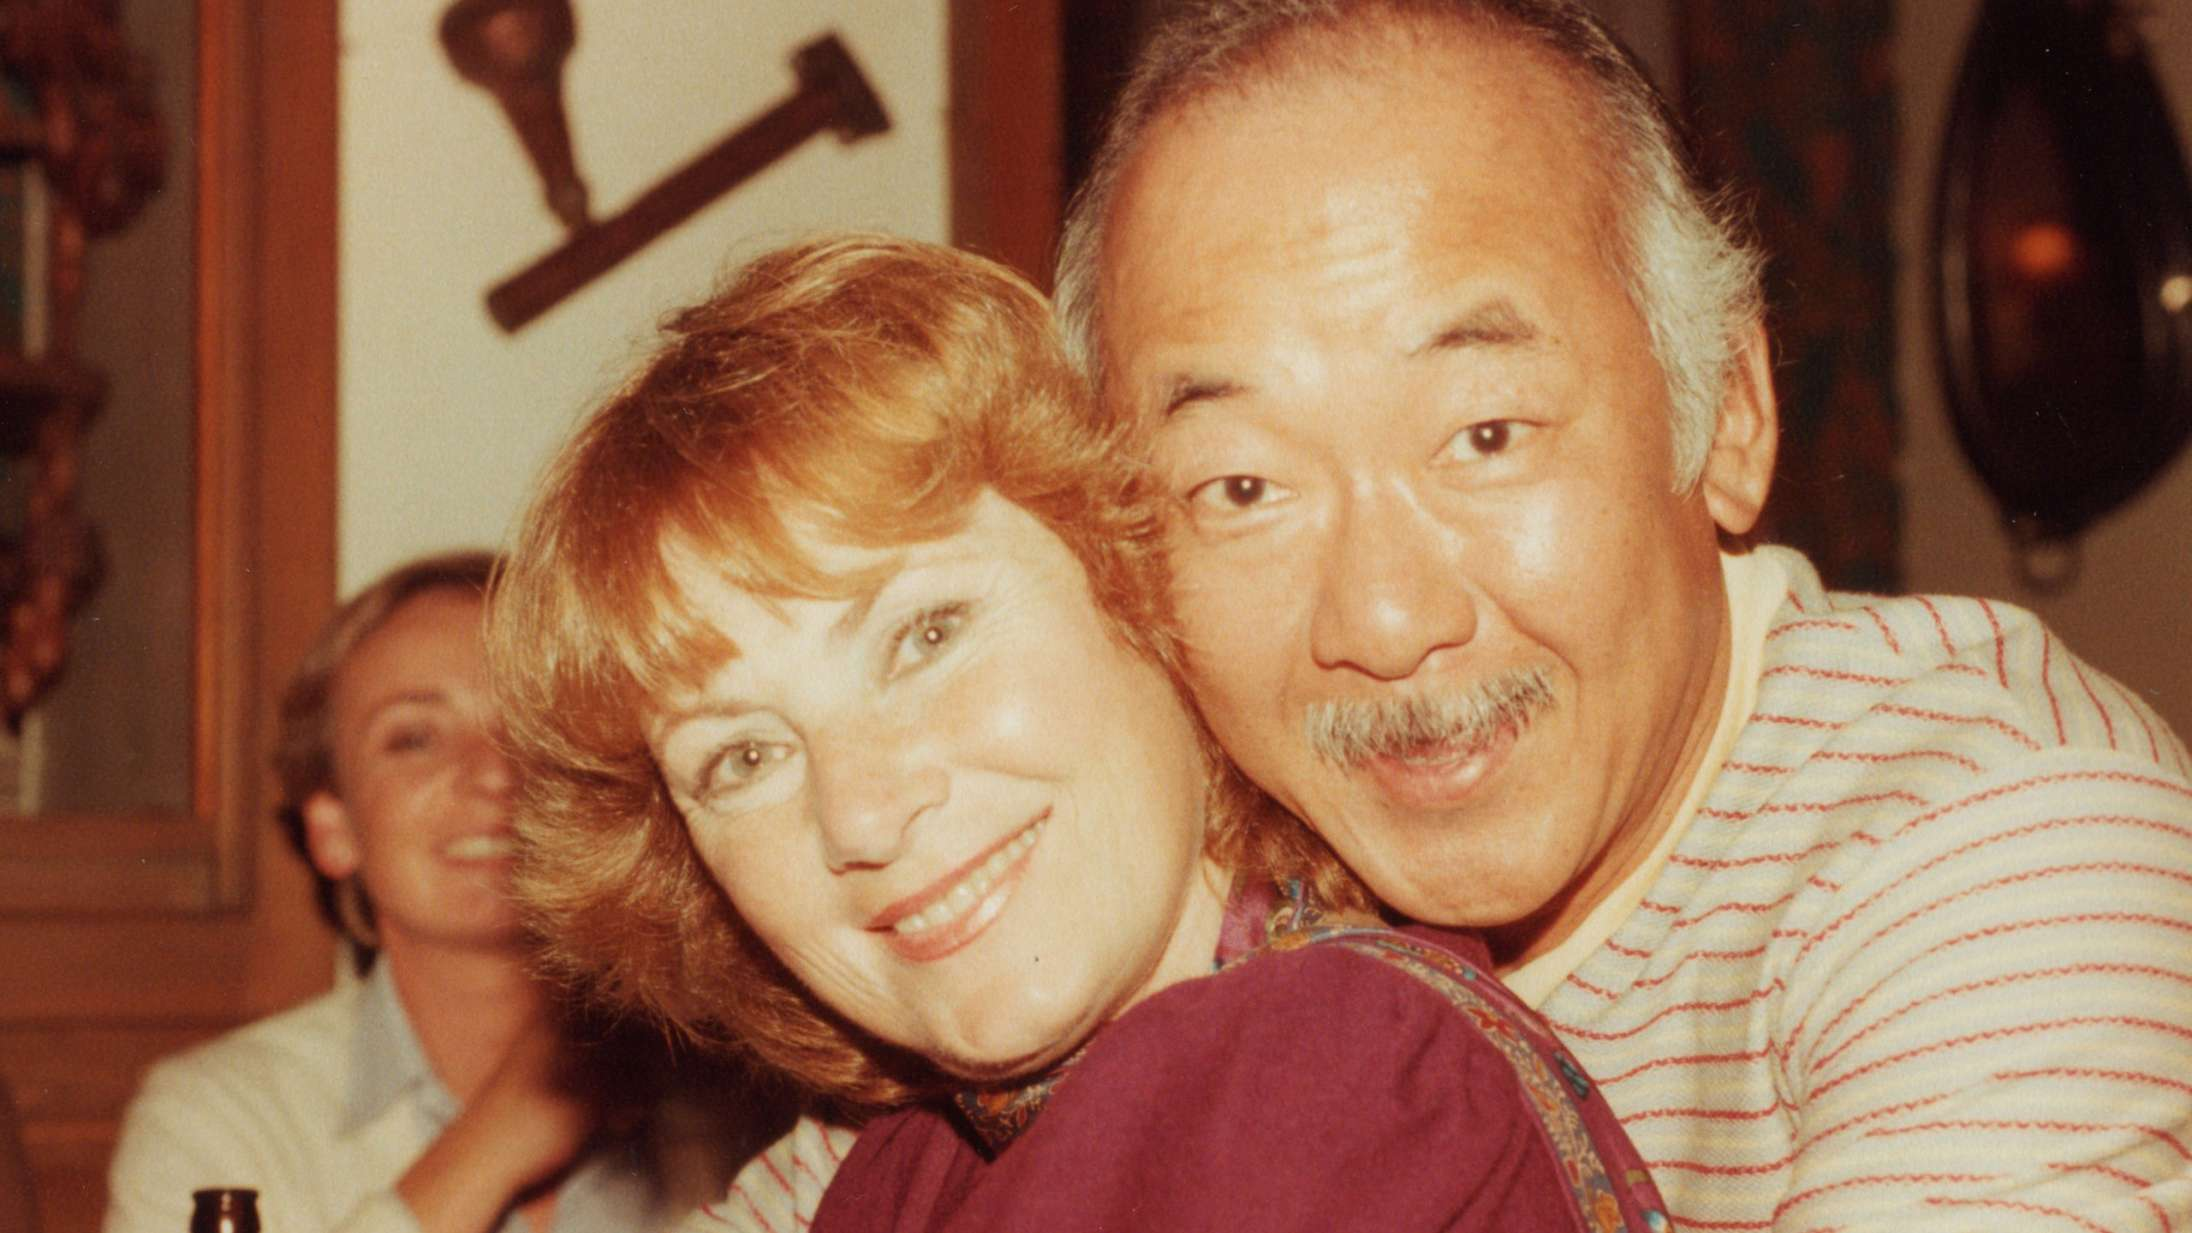 'More than Miyagi: The Pat Morita Story': Ny dokumentar optrevler karatekongens utrolige liv